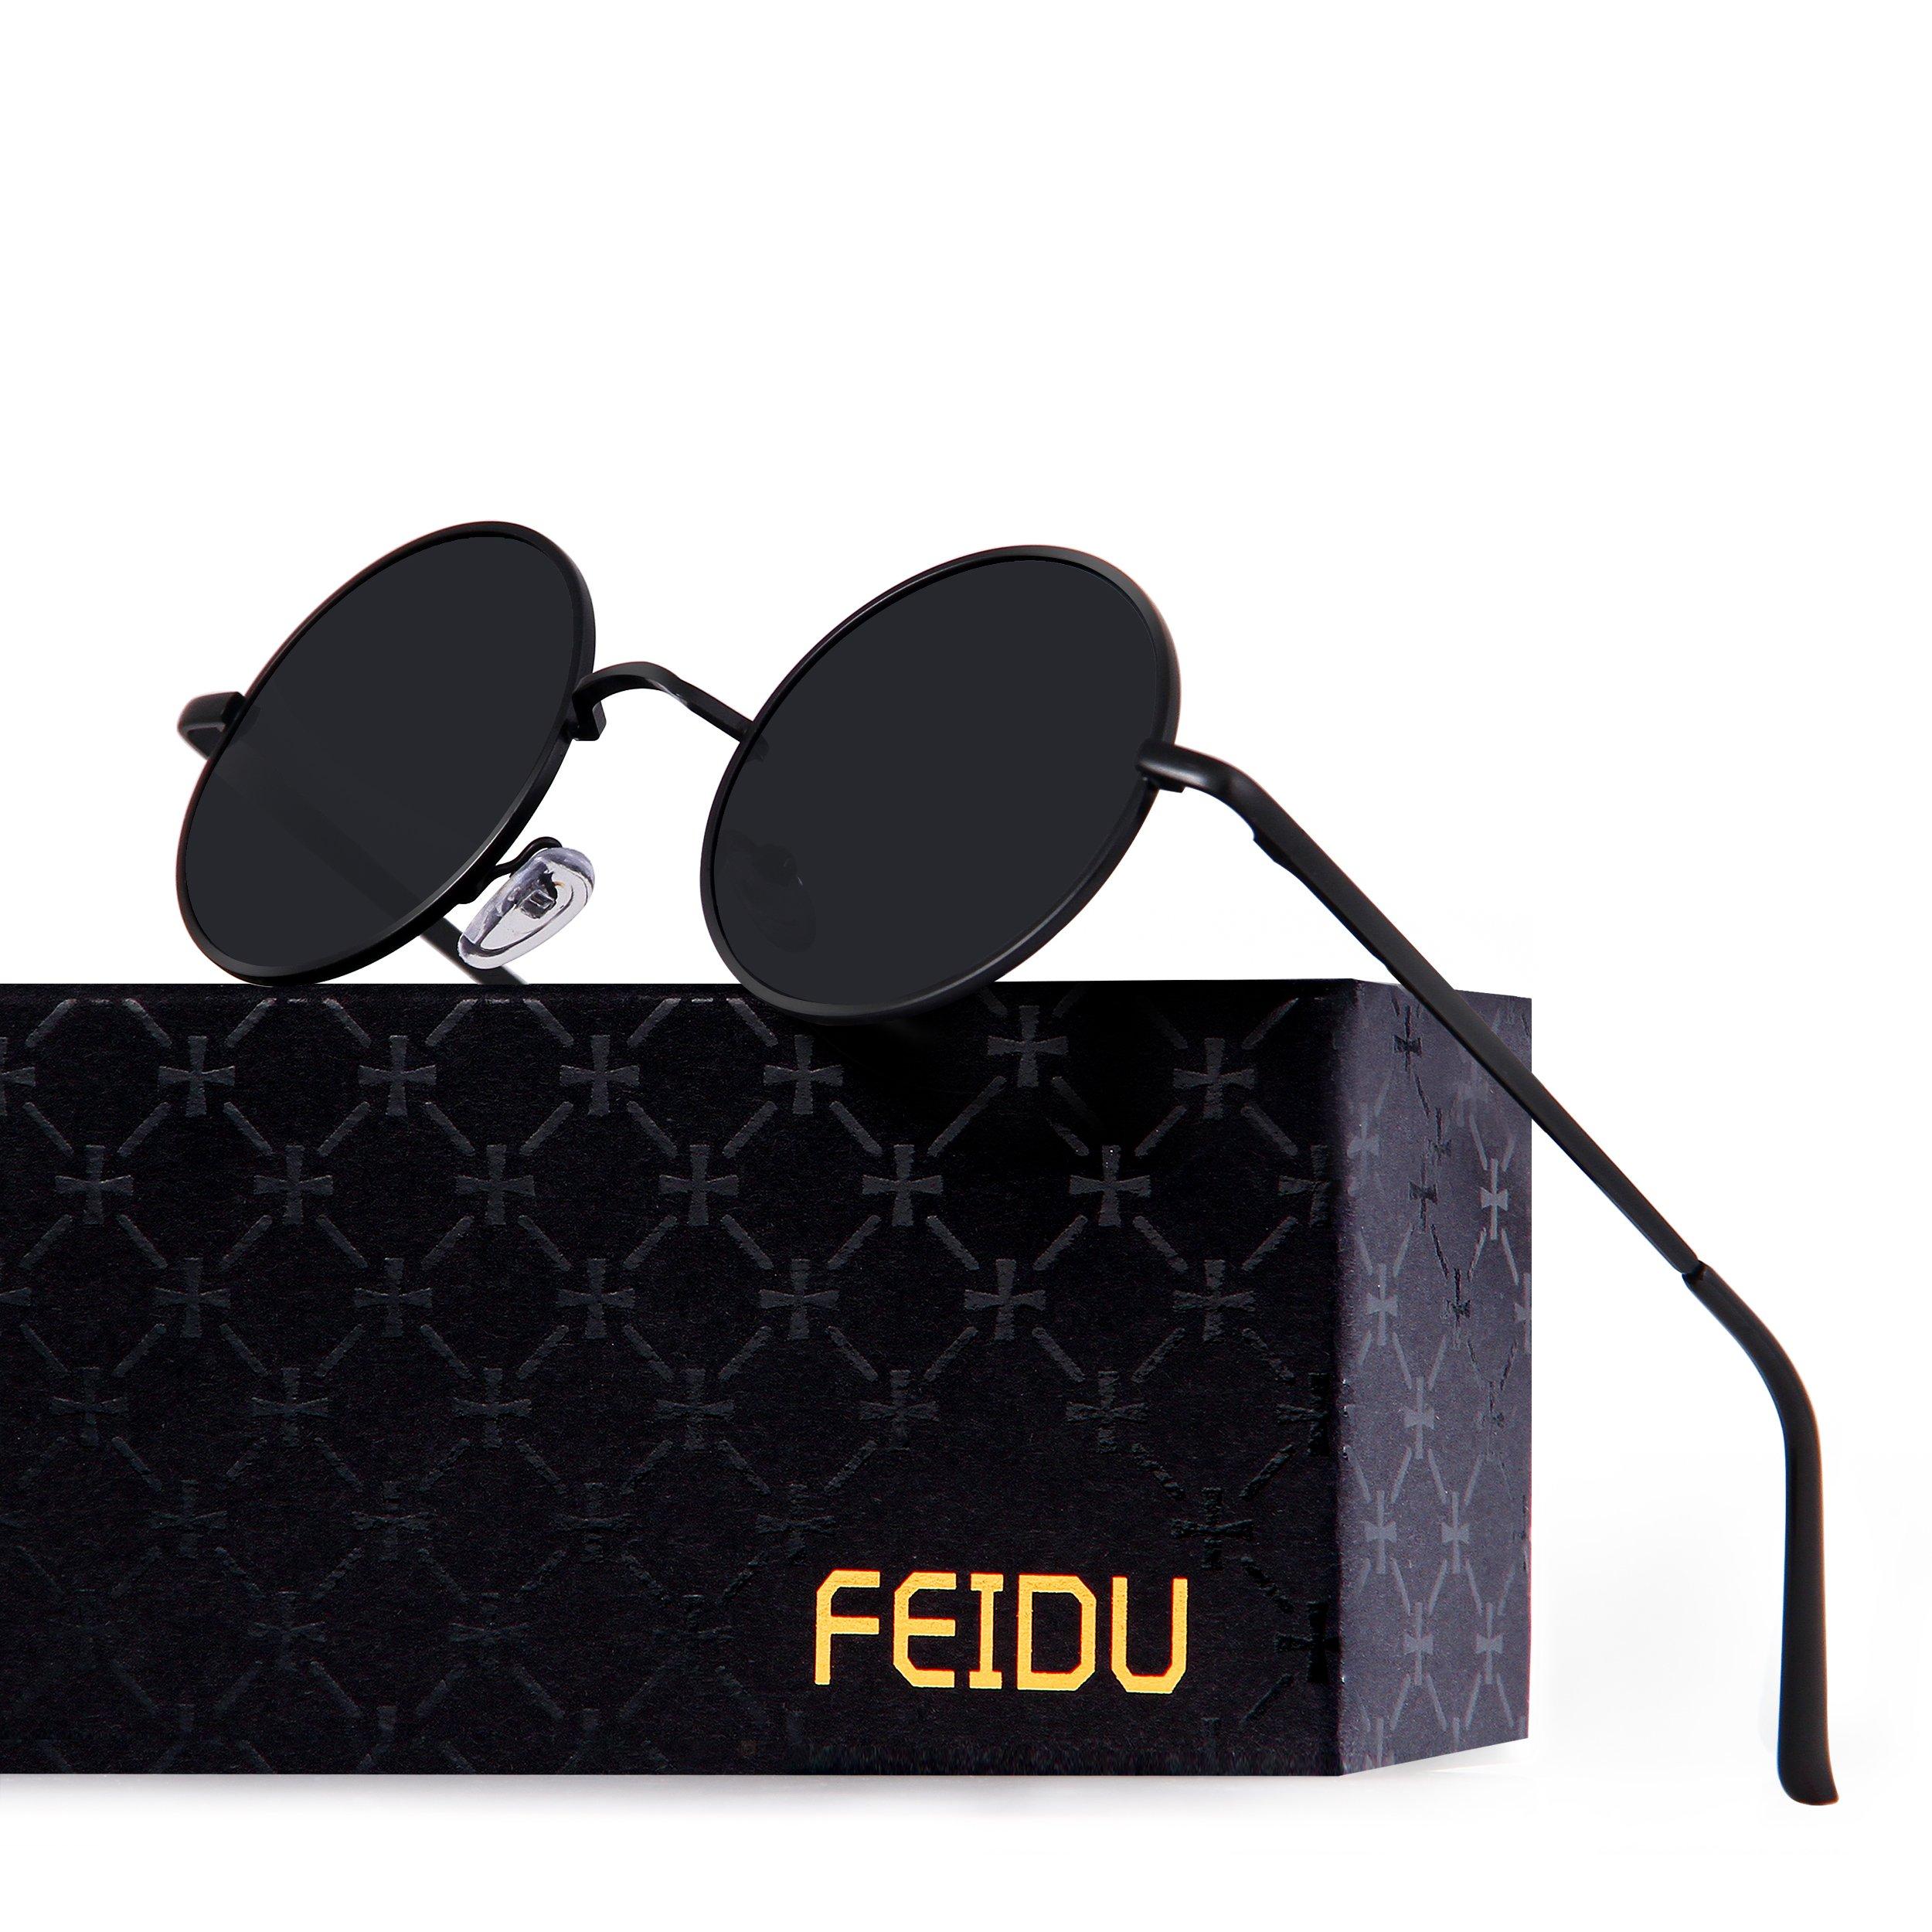 FEIDU-Men Round Retro Polarized Sunglasses Women Vintage Sunglasses FD3013 (Black/Black, 1.81) by FEIDU